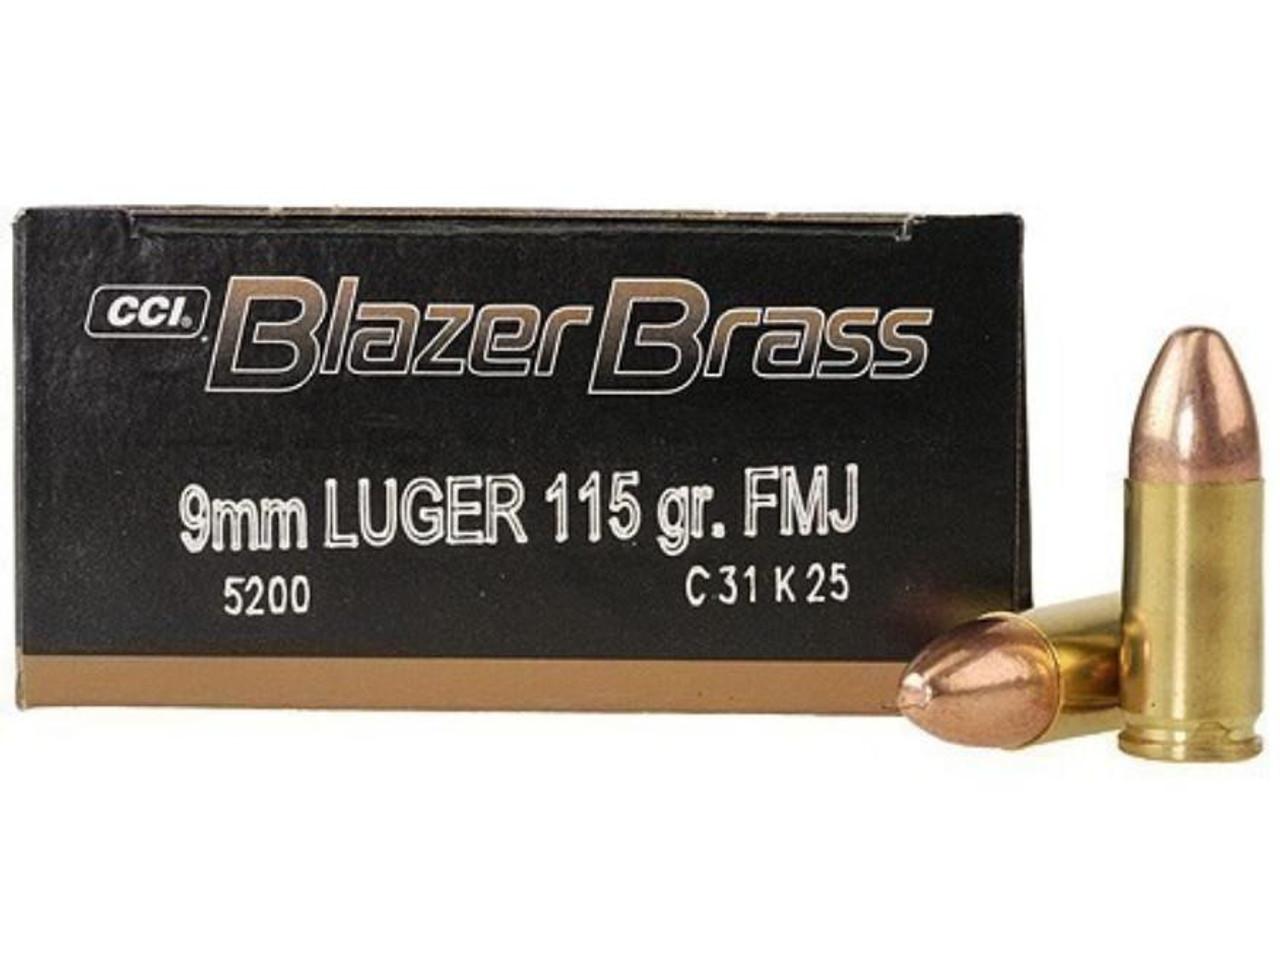 9mm Luger 115Gr FMJ Blazer Brass